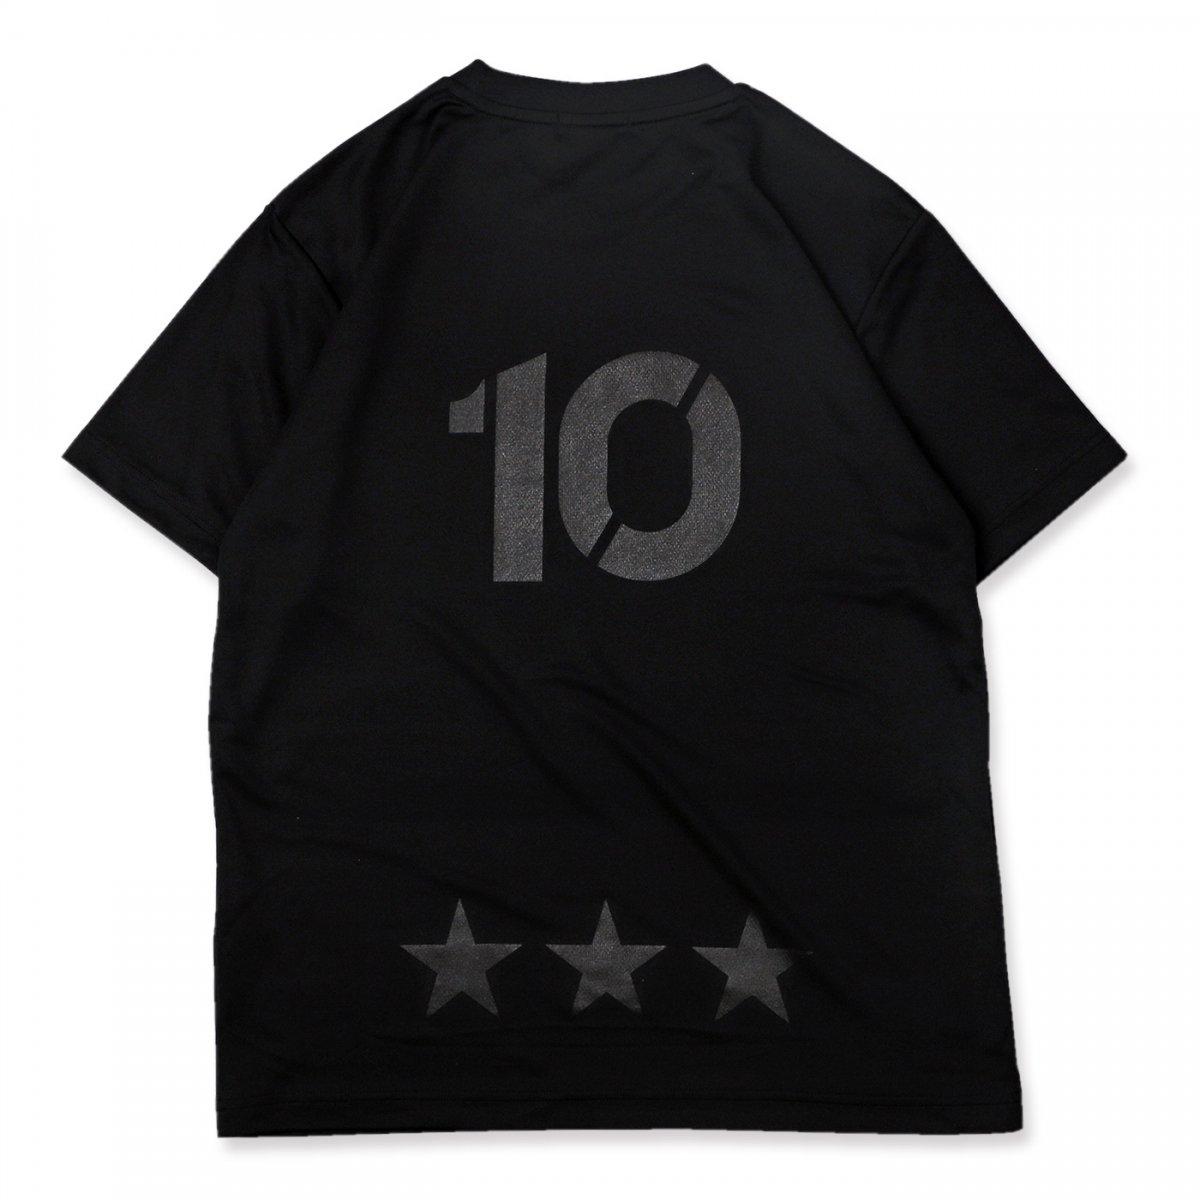 BB10 tee [DRY]【black】